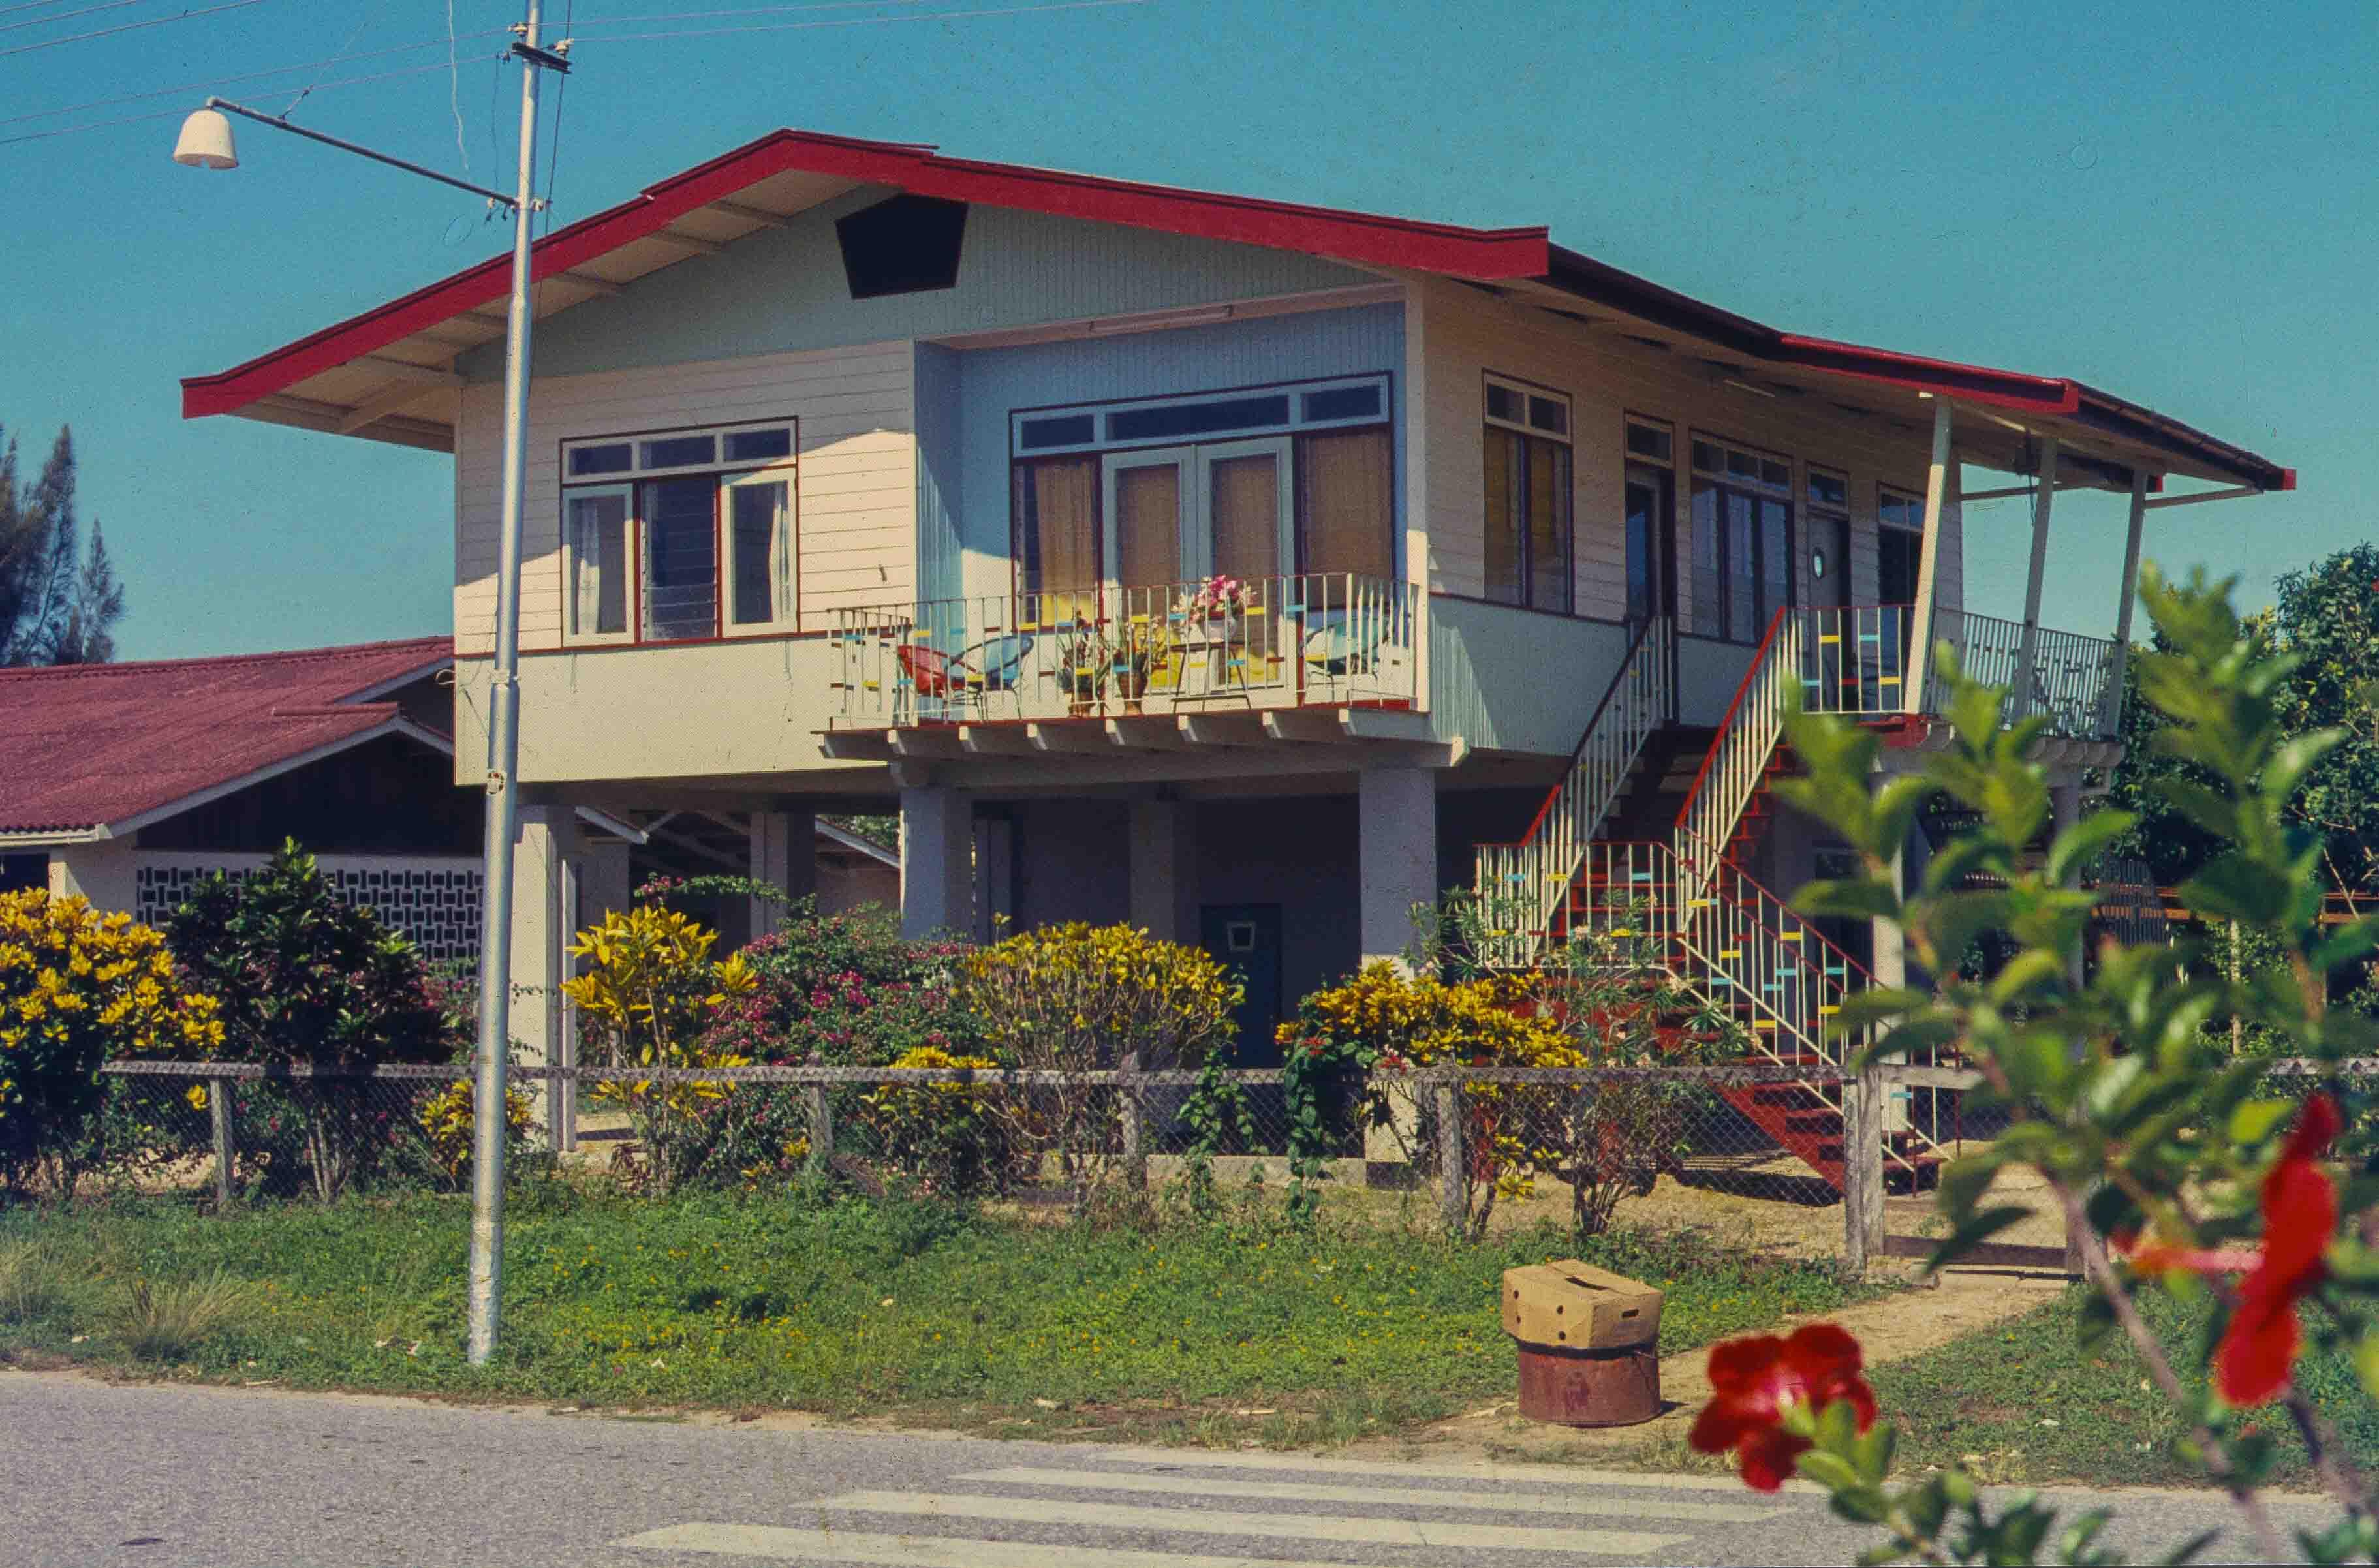 213. Suriname